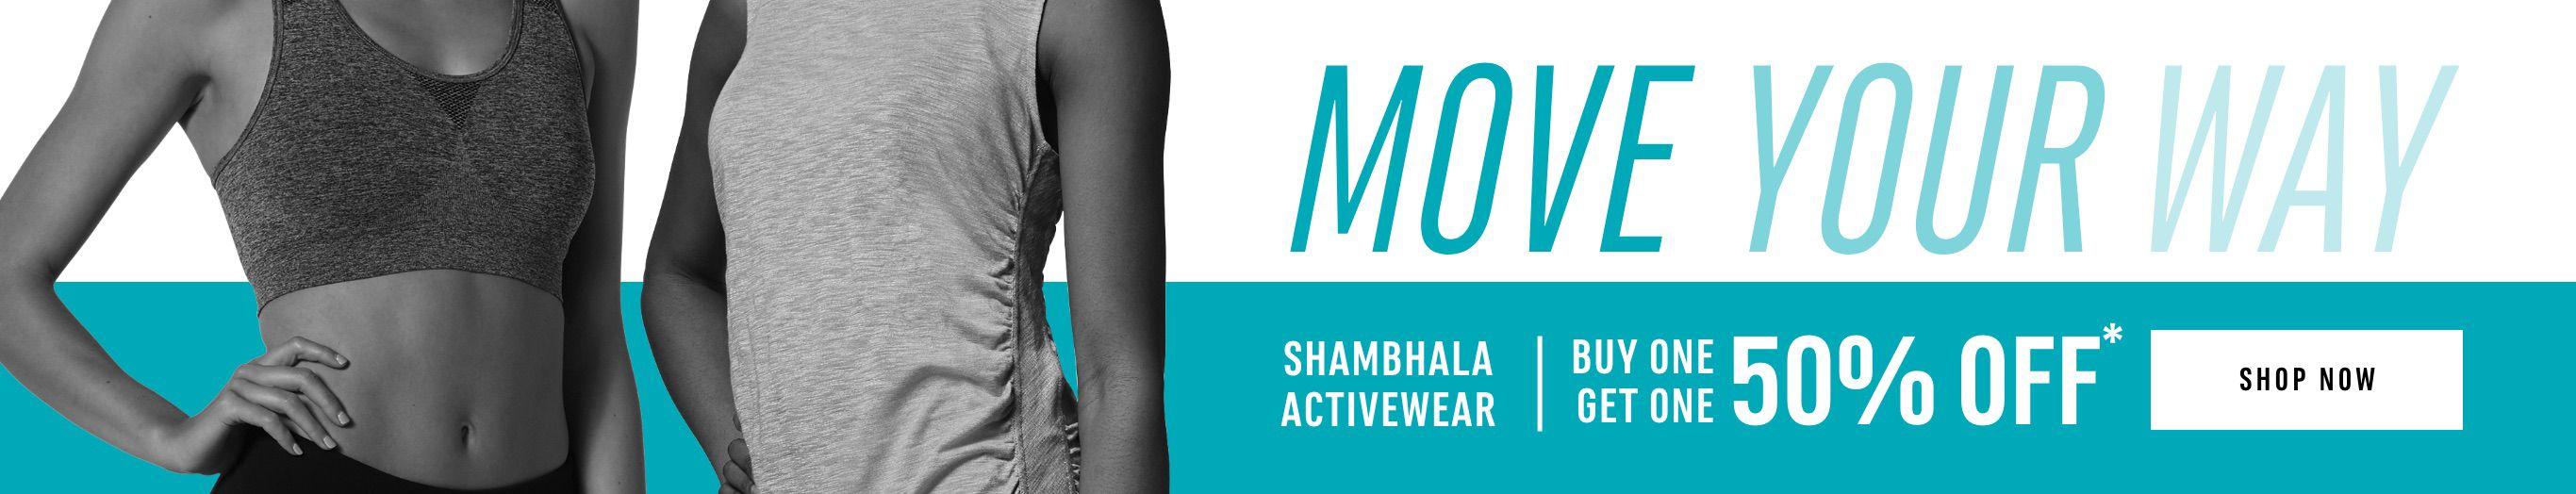 Moev Your Way! Shambhala Activewear - Buy One Get One 50% OFF*. Shop Now!